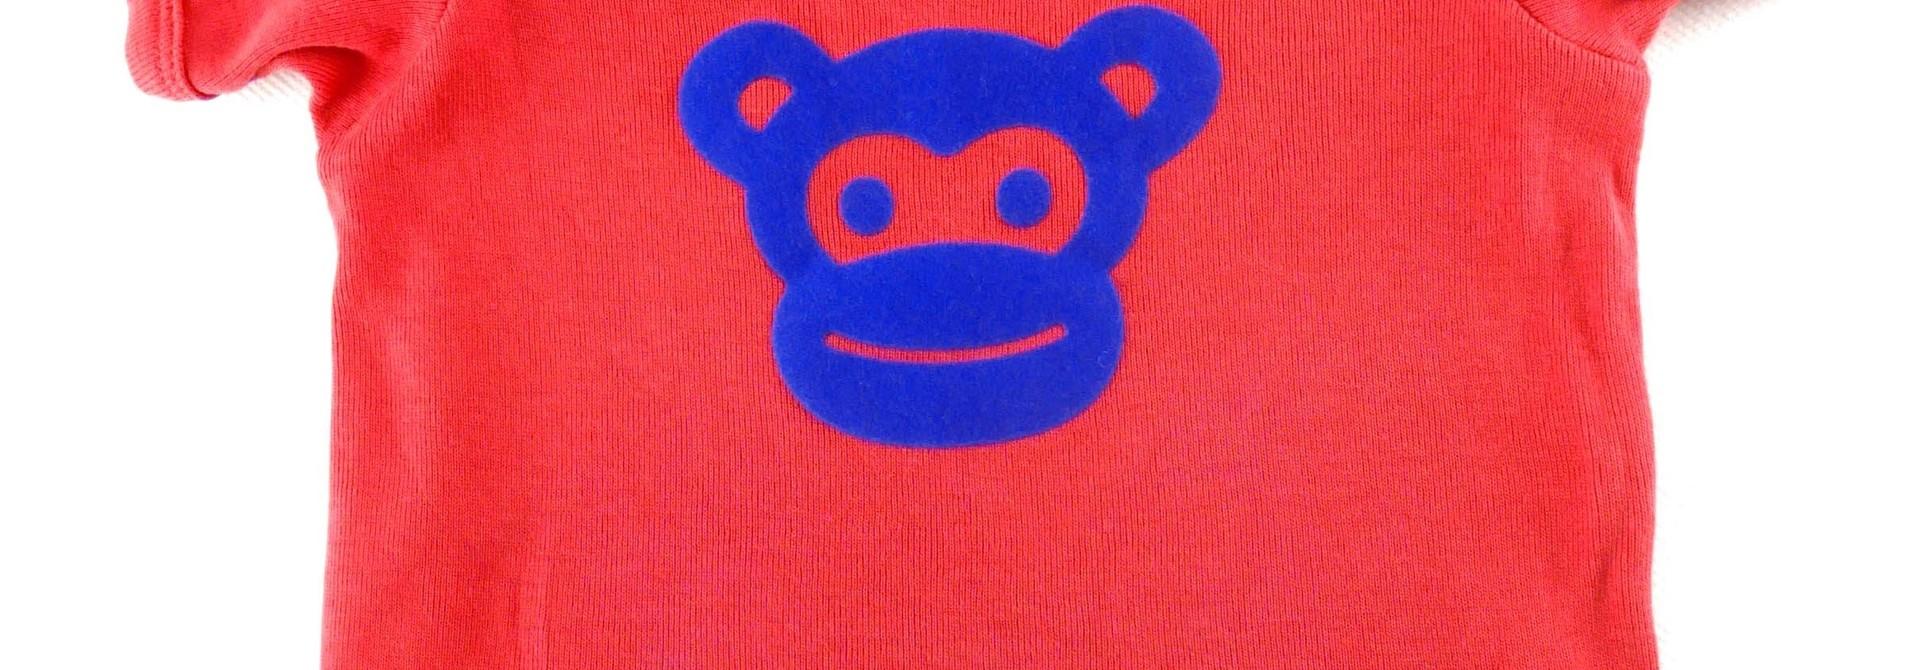 T-shirt Tapete